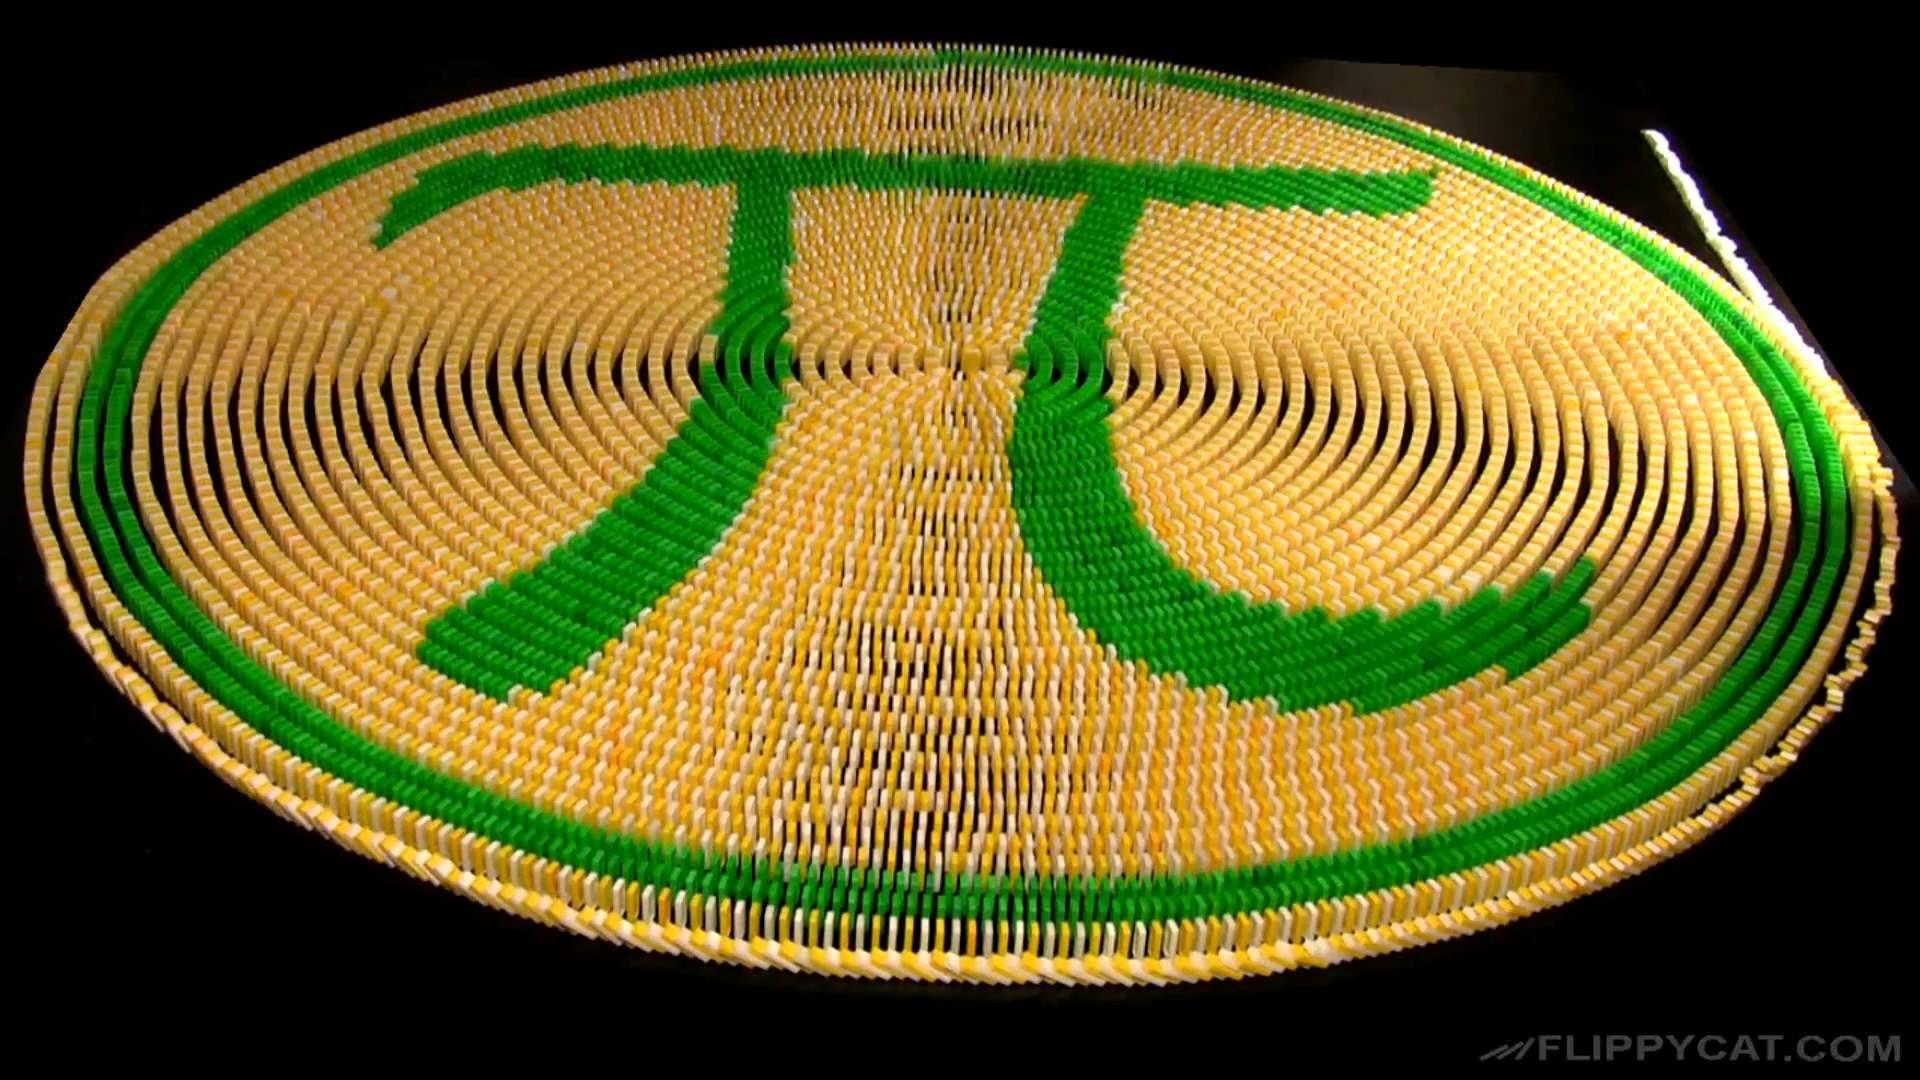 Happy Pi Day 3 14 Domino Spiral Matematik Calisma